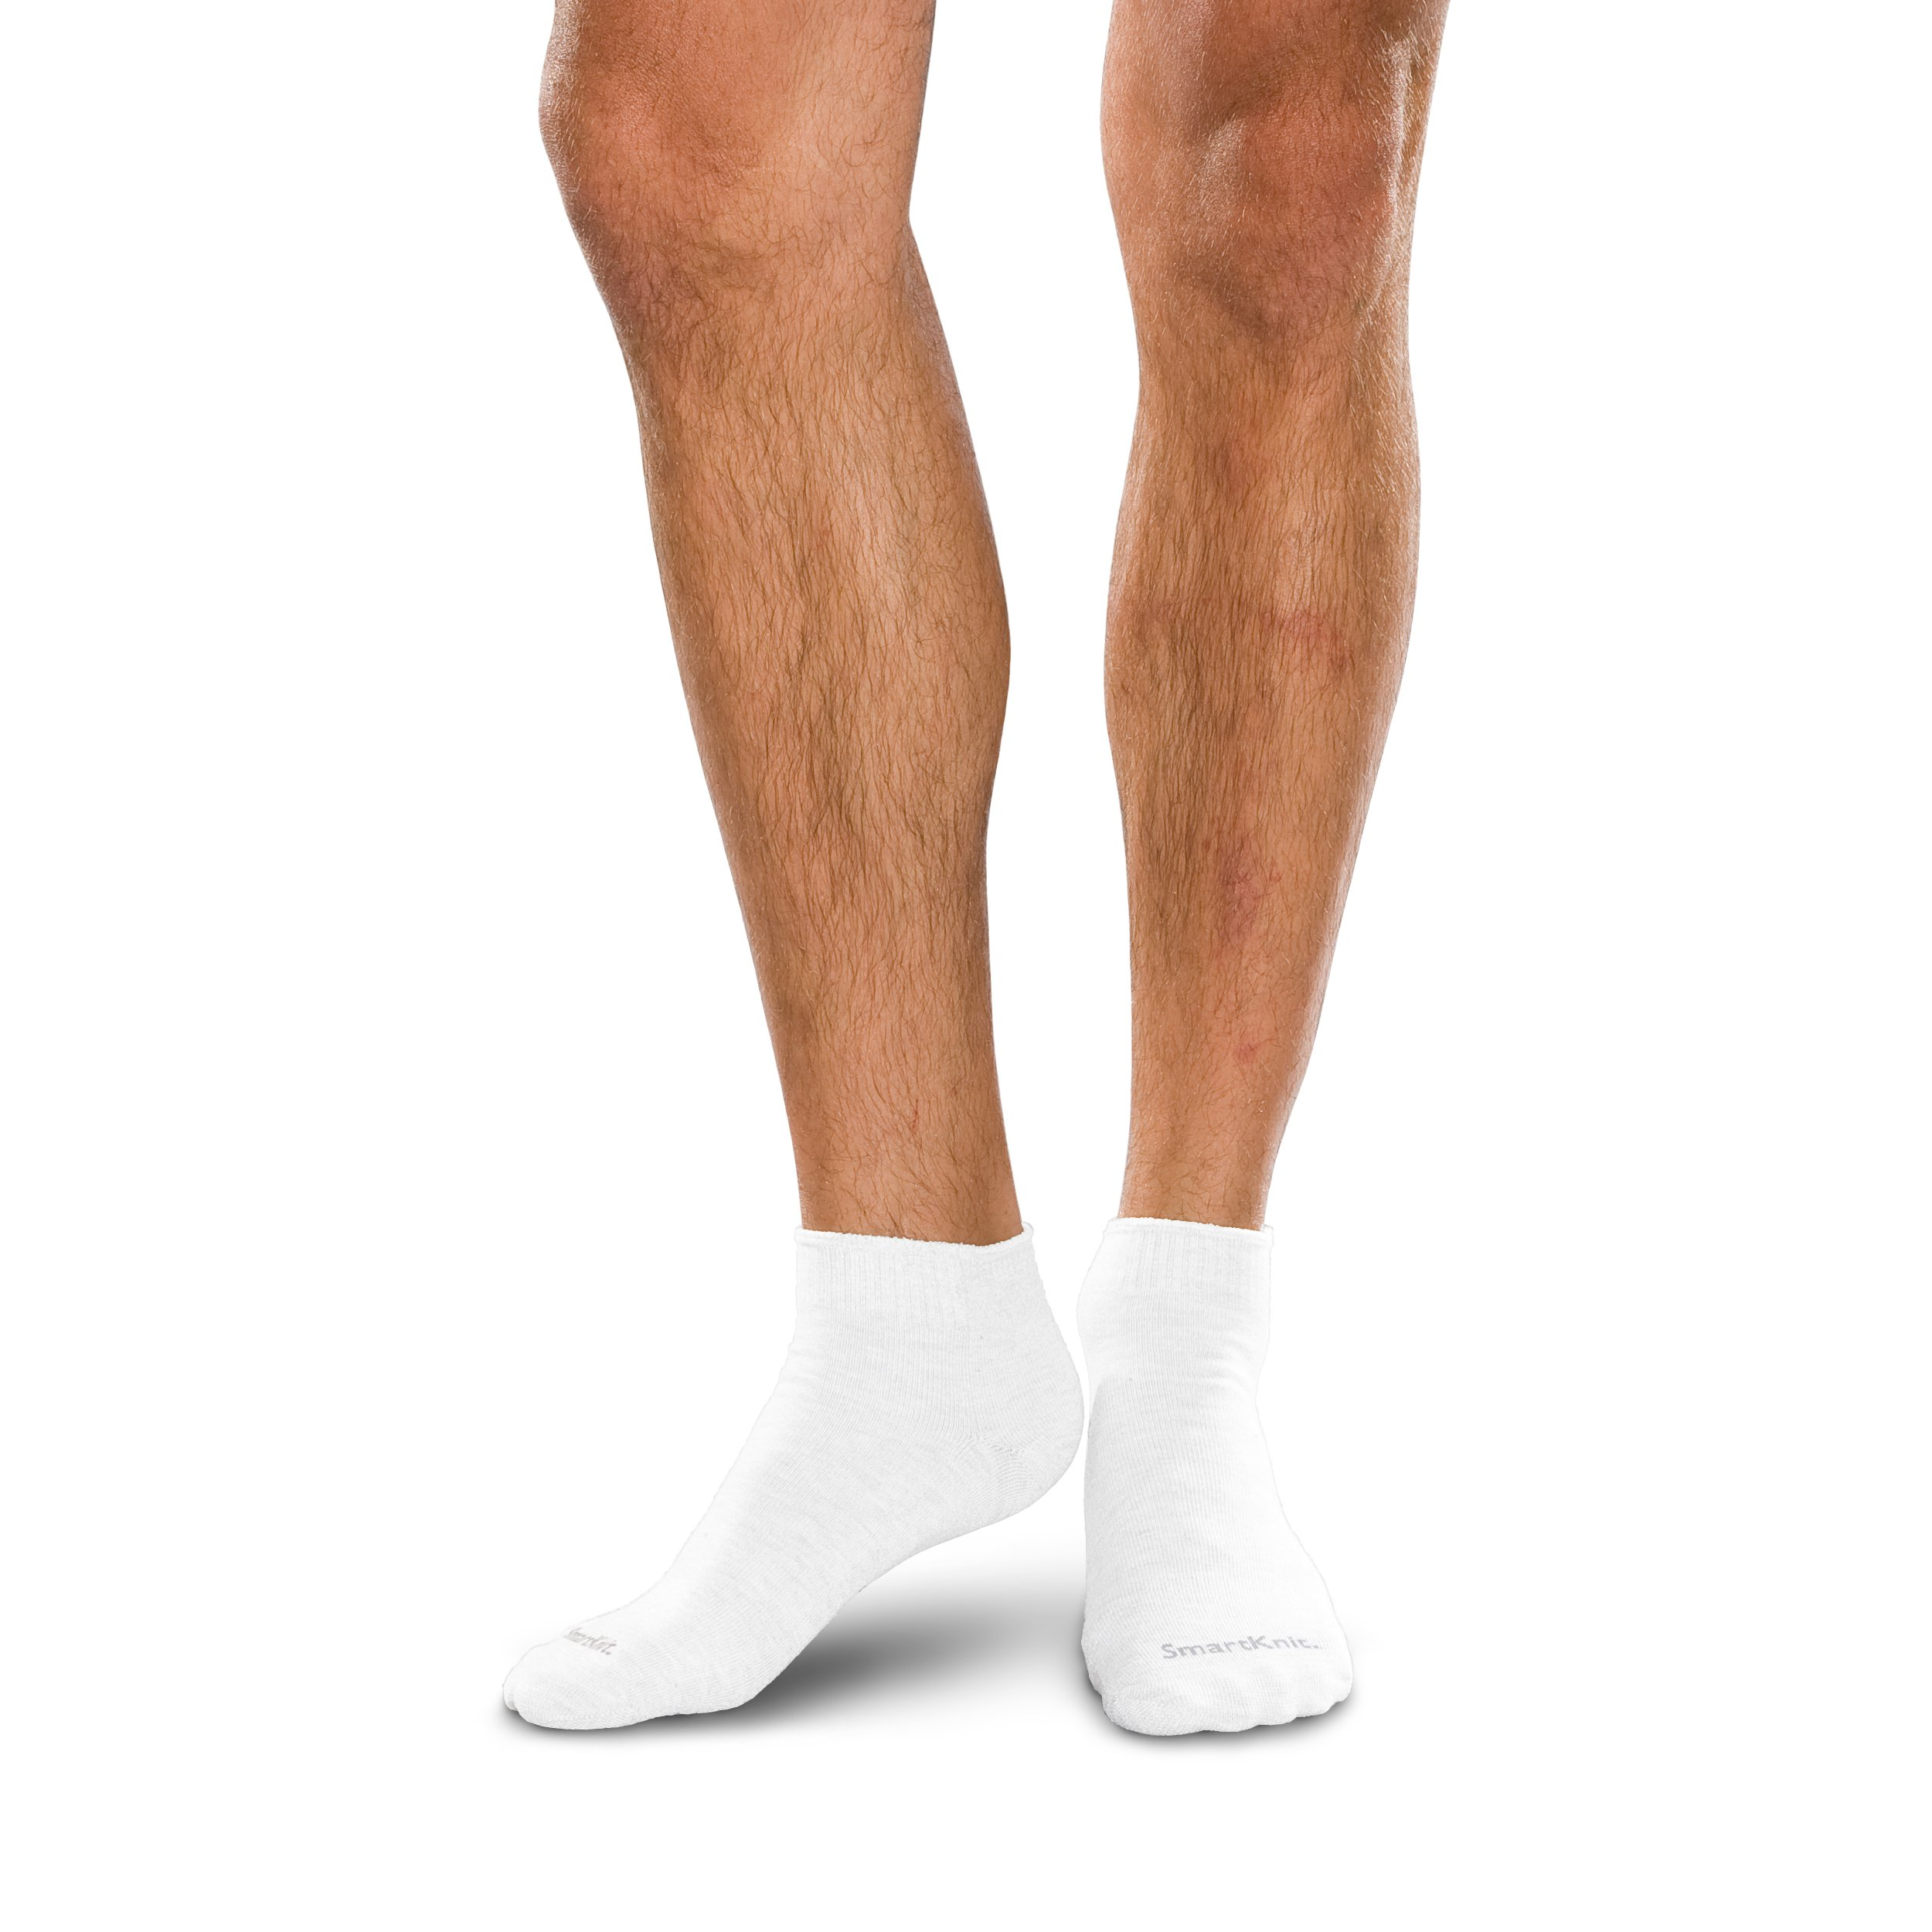 SmartKnit Seamless Mini-Crew Socks for Diabetes, Arthritis or Sensitive Feet (White, Medium)